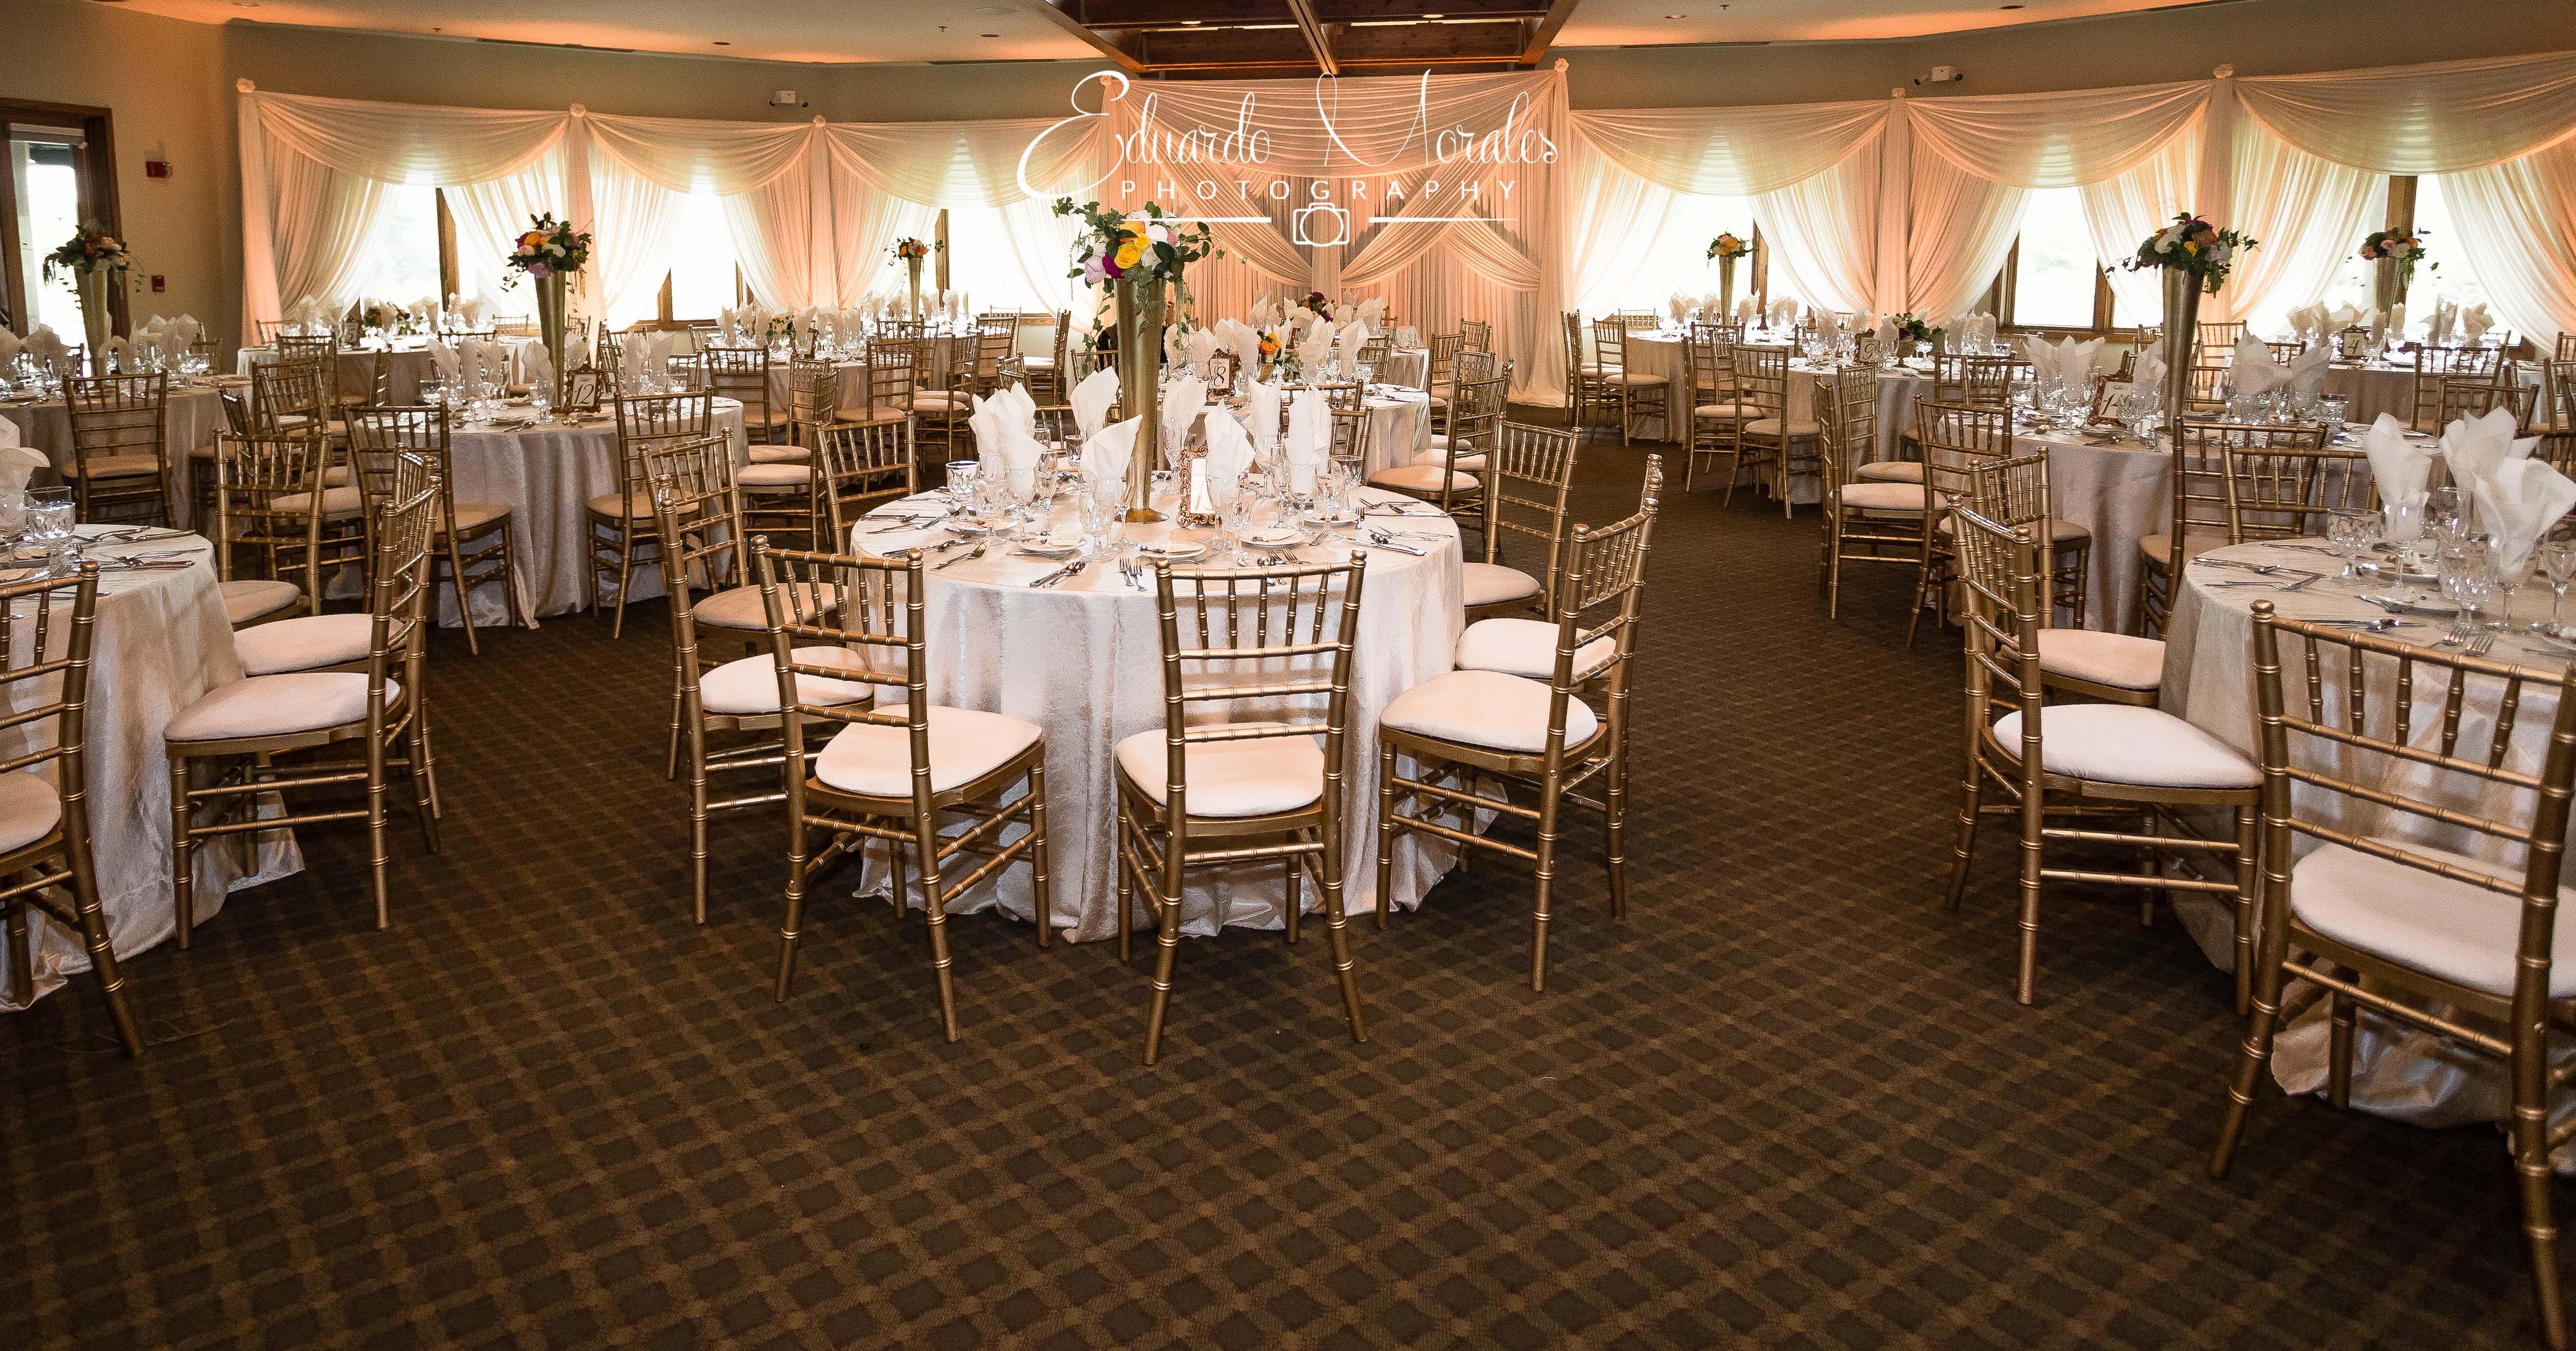 Wedding Room D Uplighting Seven Bridges Golf Club